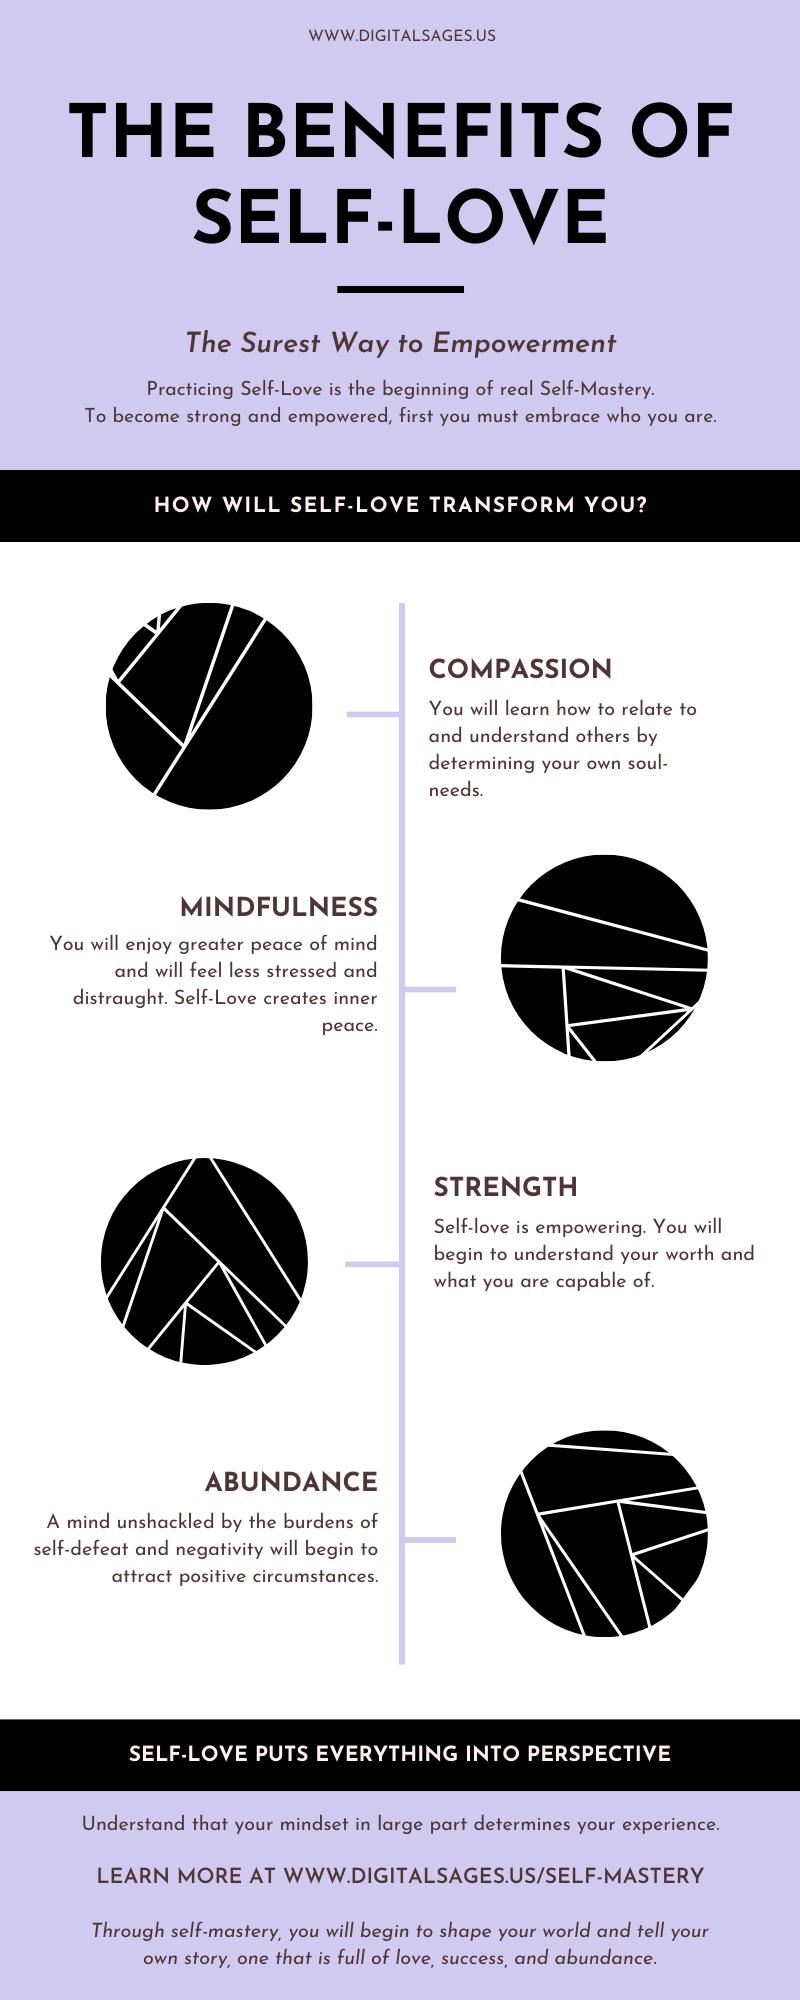 Self-Love Benefits Infographic